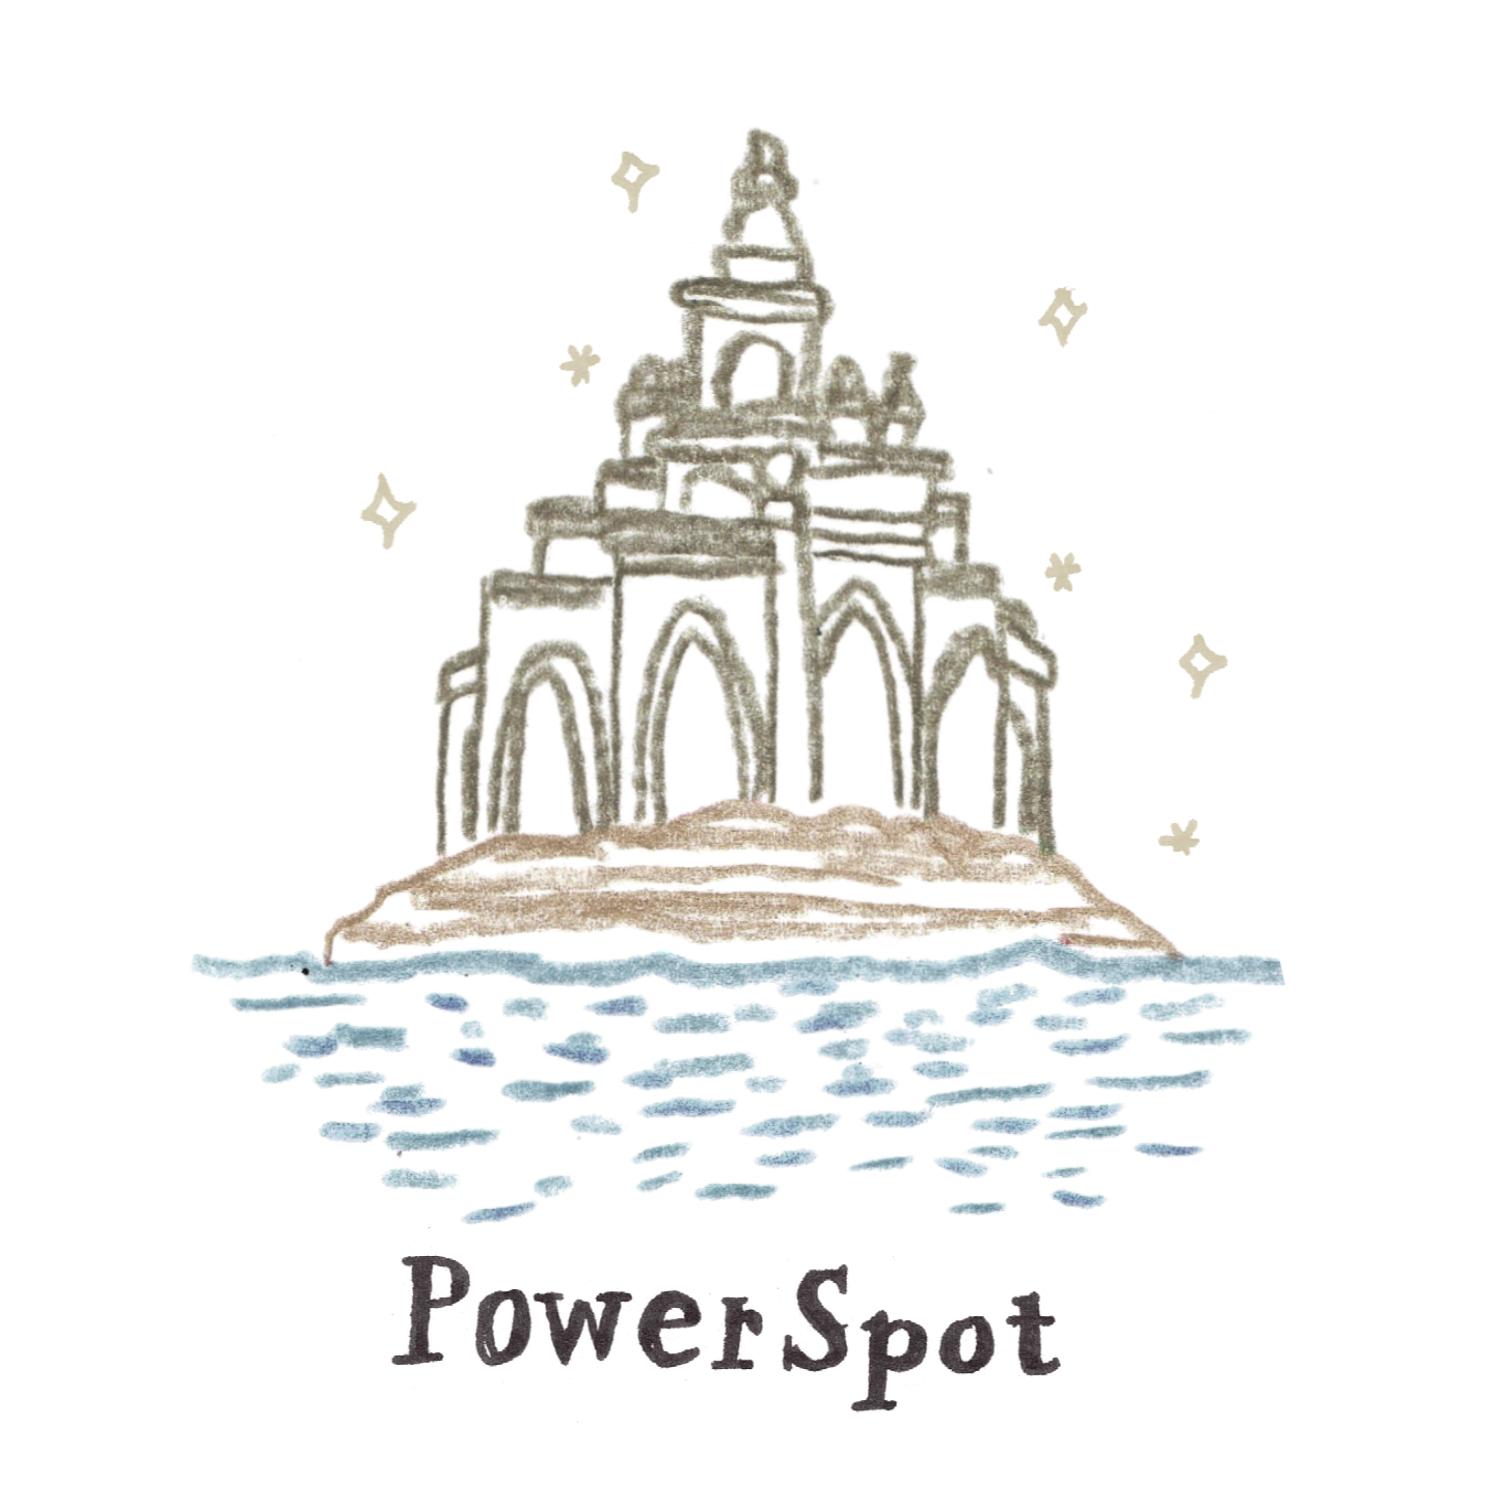 D:パワースポット巡礼